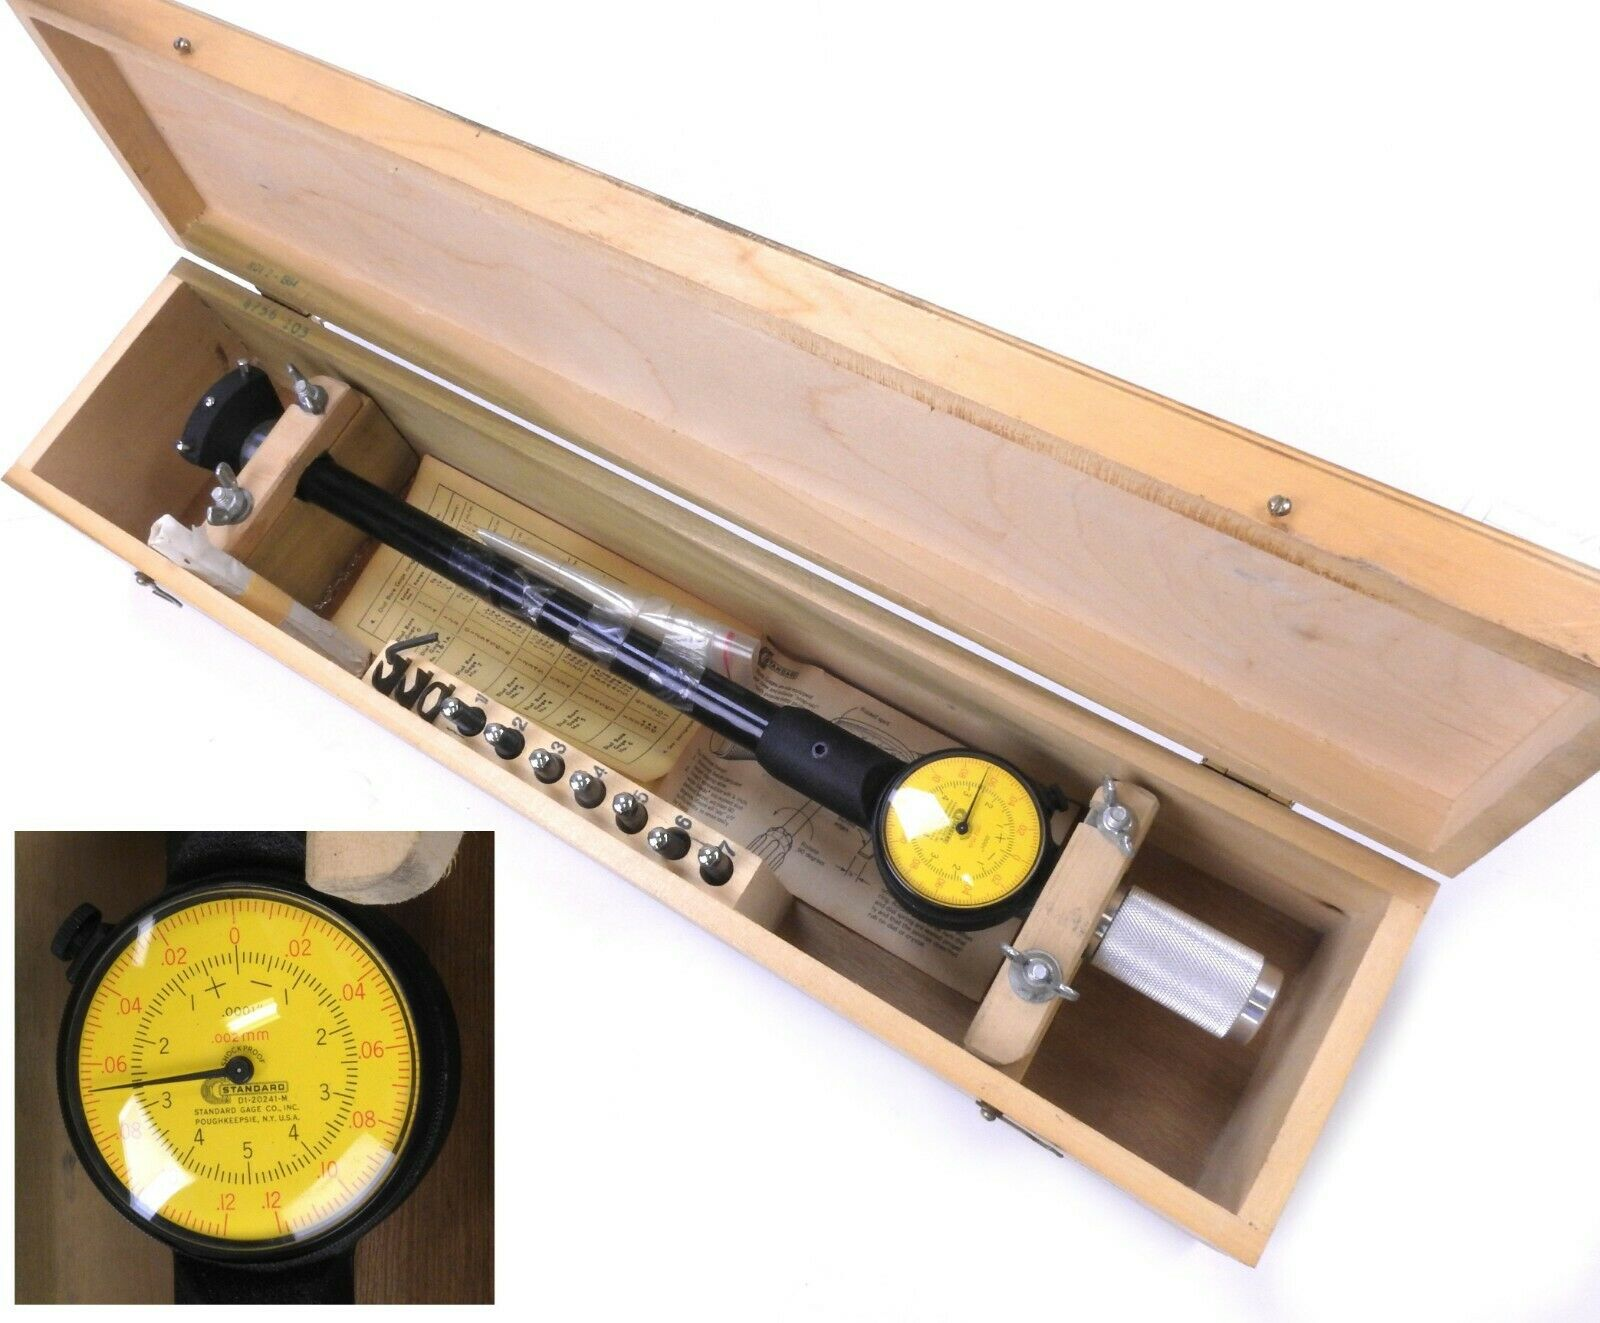 Standard Dorsey Dual Scale Dial Bore Gage No 5